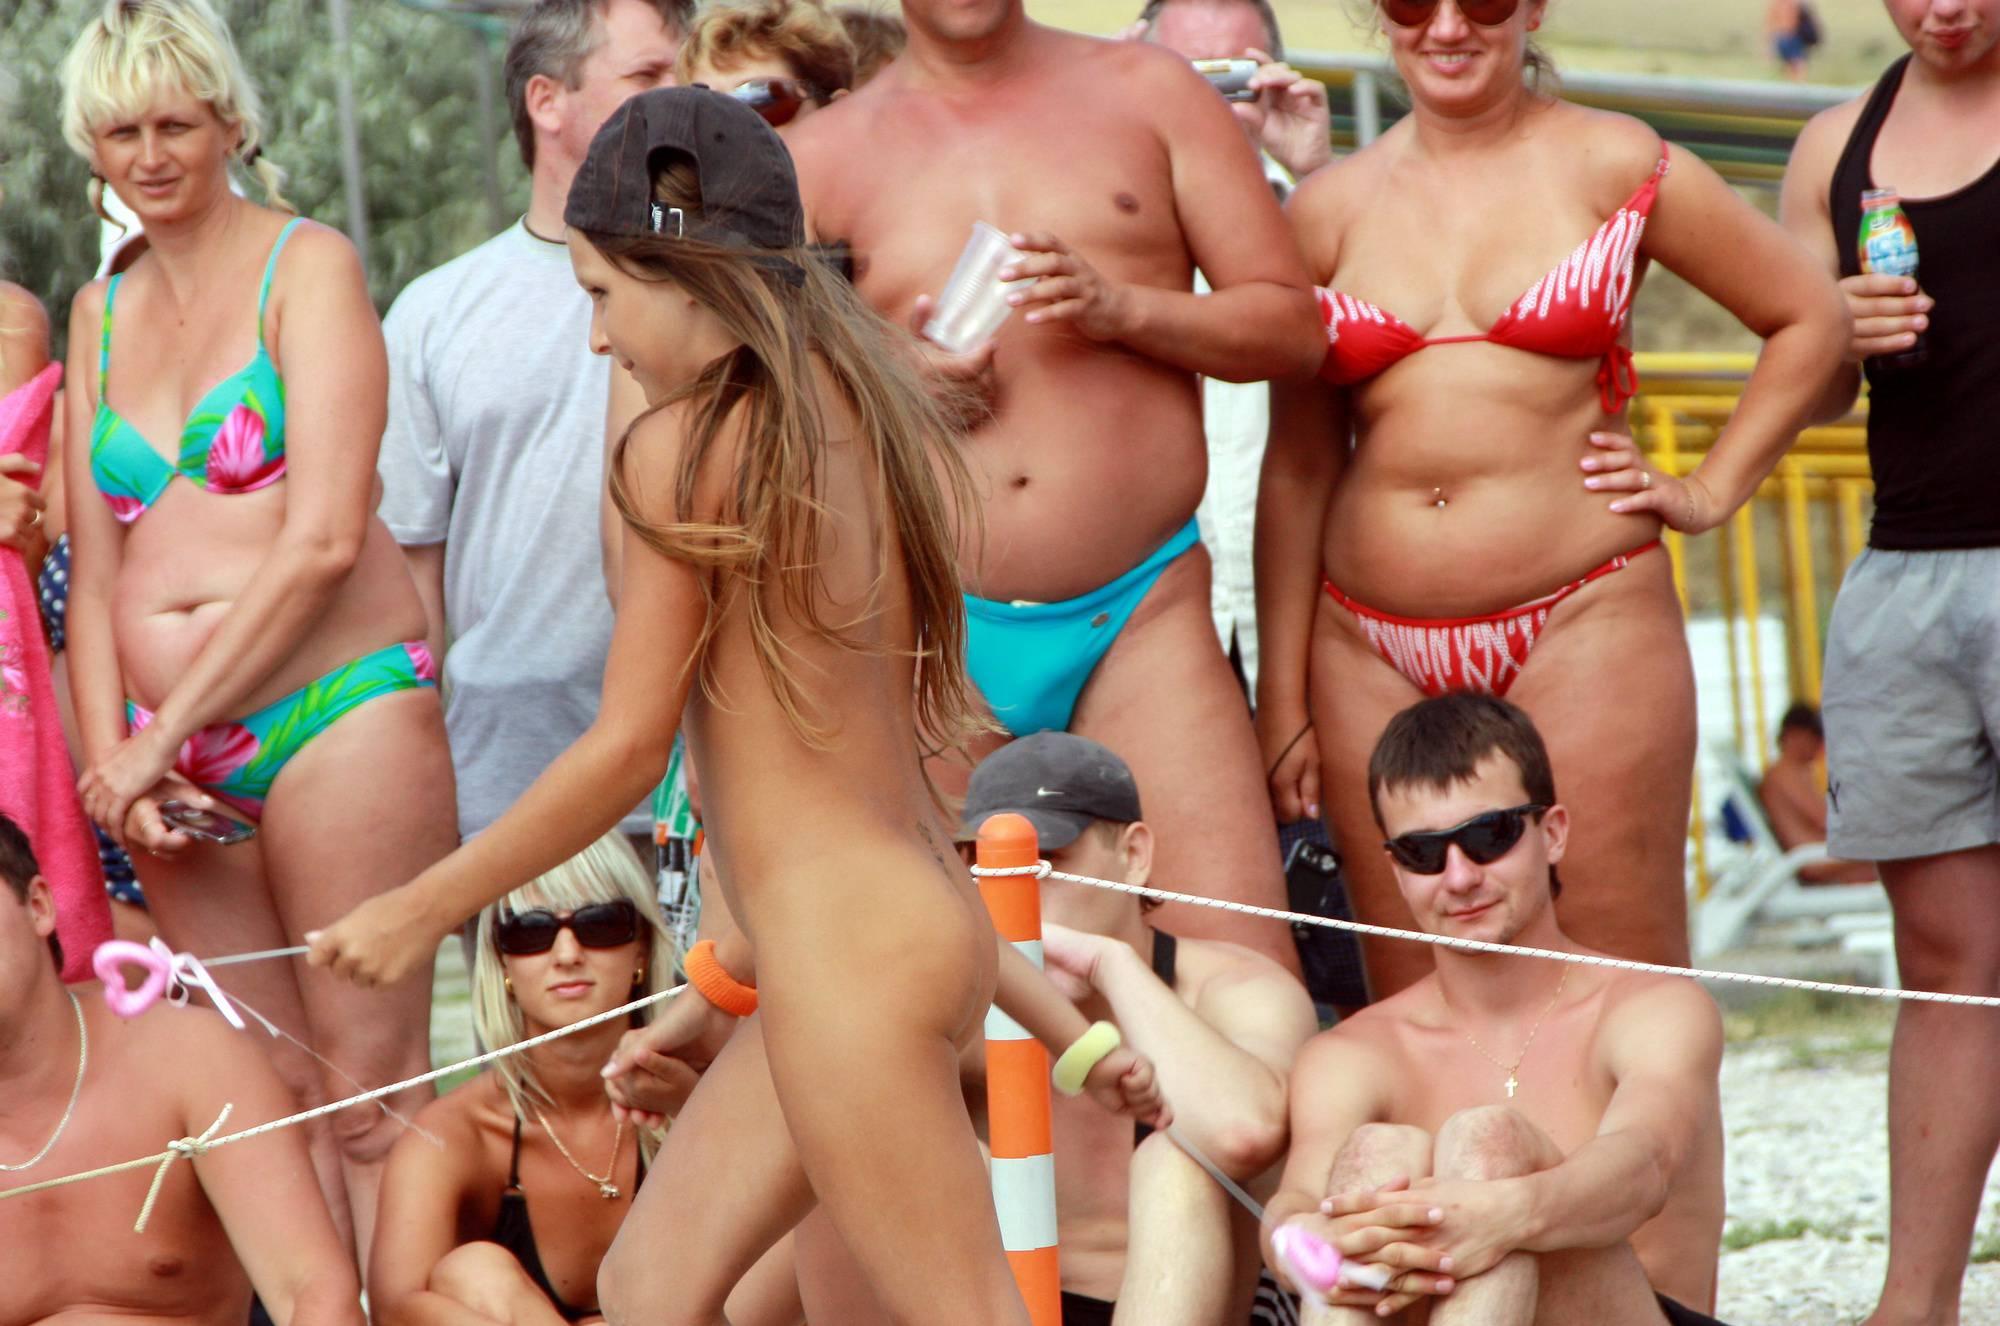 Purenudism Images Nudist Duet Girl Rundown - 2